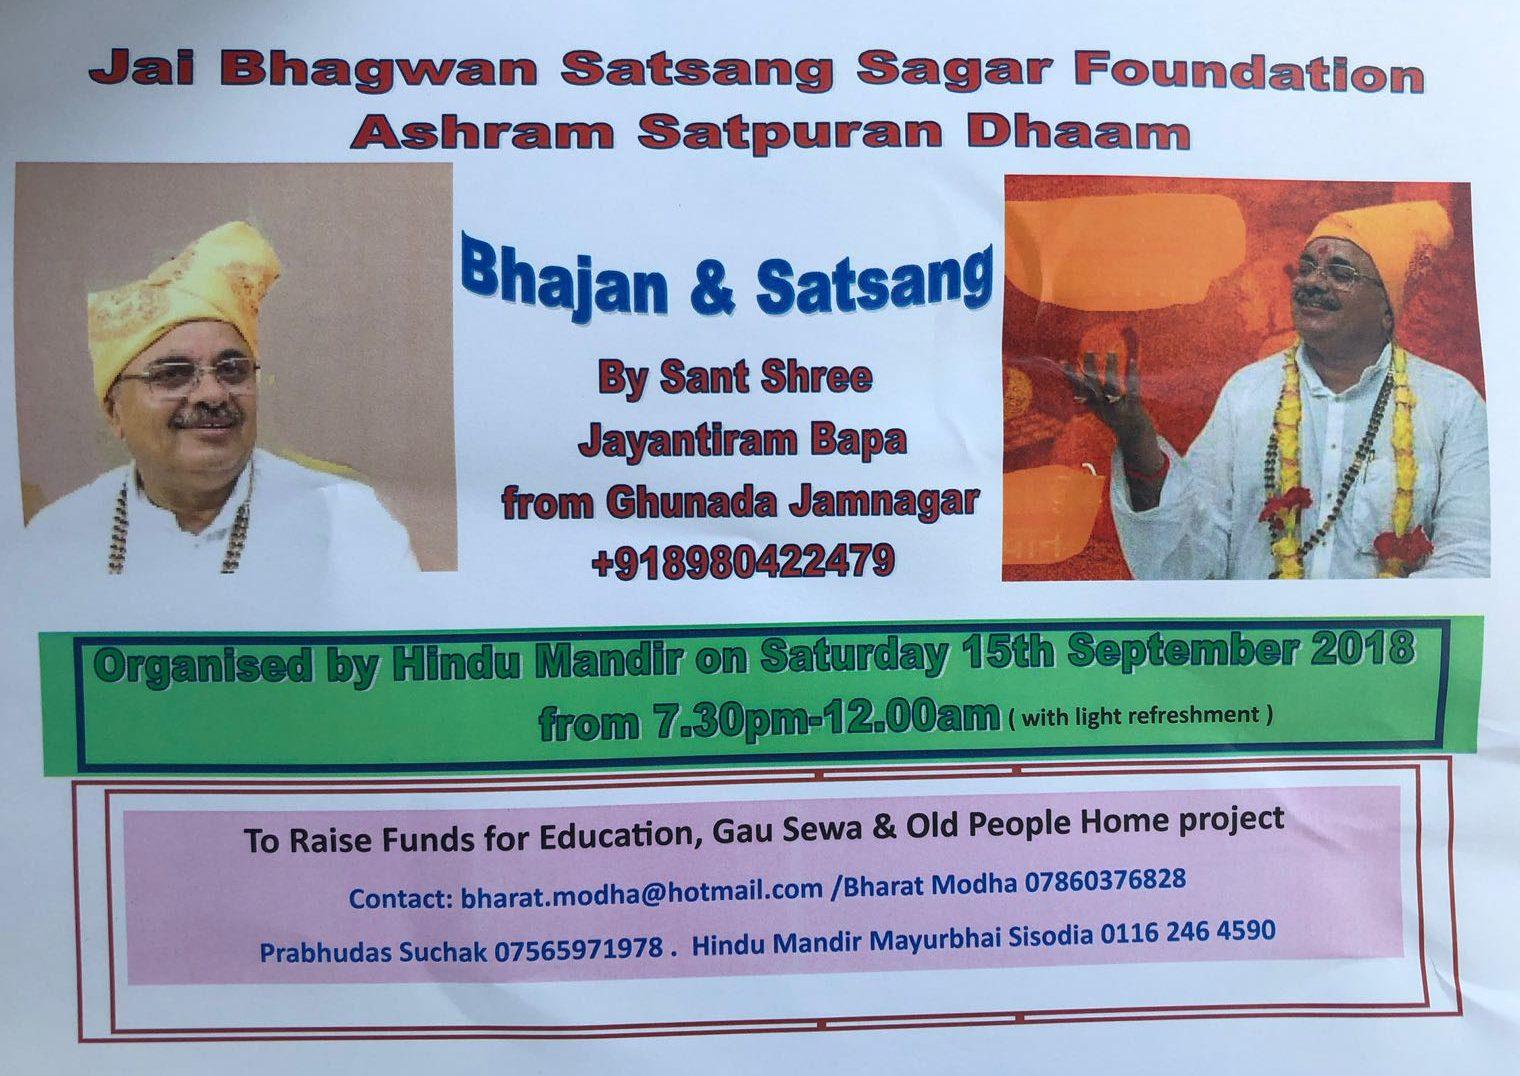 Bhajan and Satsang with Jayantiram Bapa on Saturday 15 September 2018 from 7:30pm at Shree Hindu Temple & Community Centre, Leicester